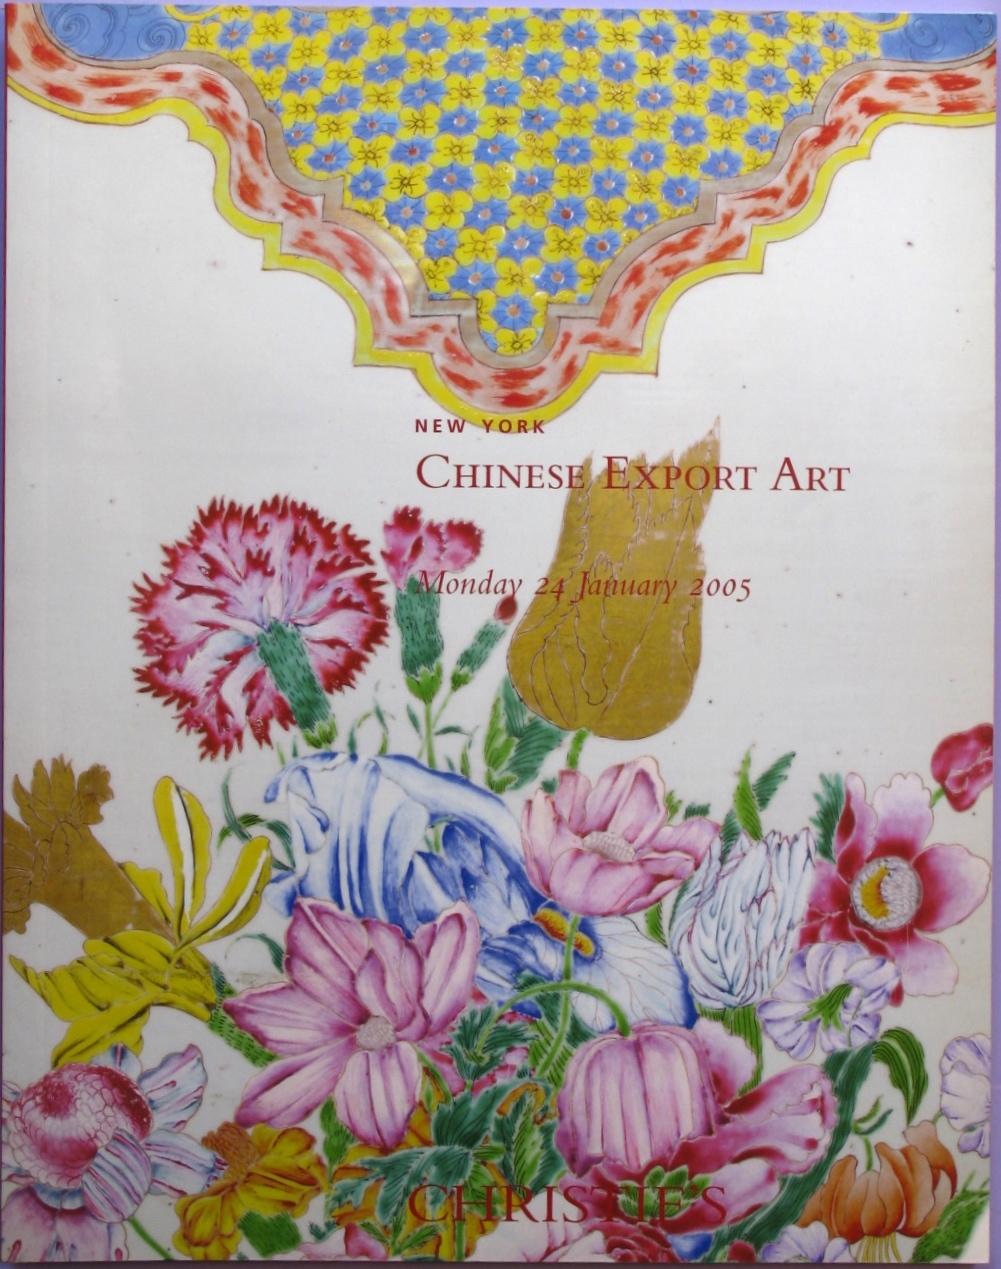 CNY20050124: Bookshop: [2005] Christie's New York Chinese Export Art